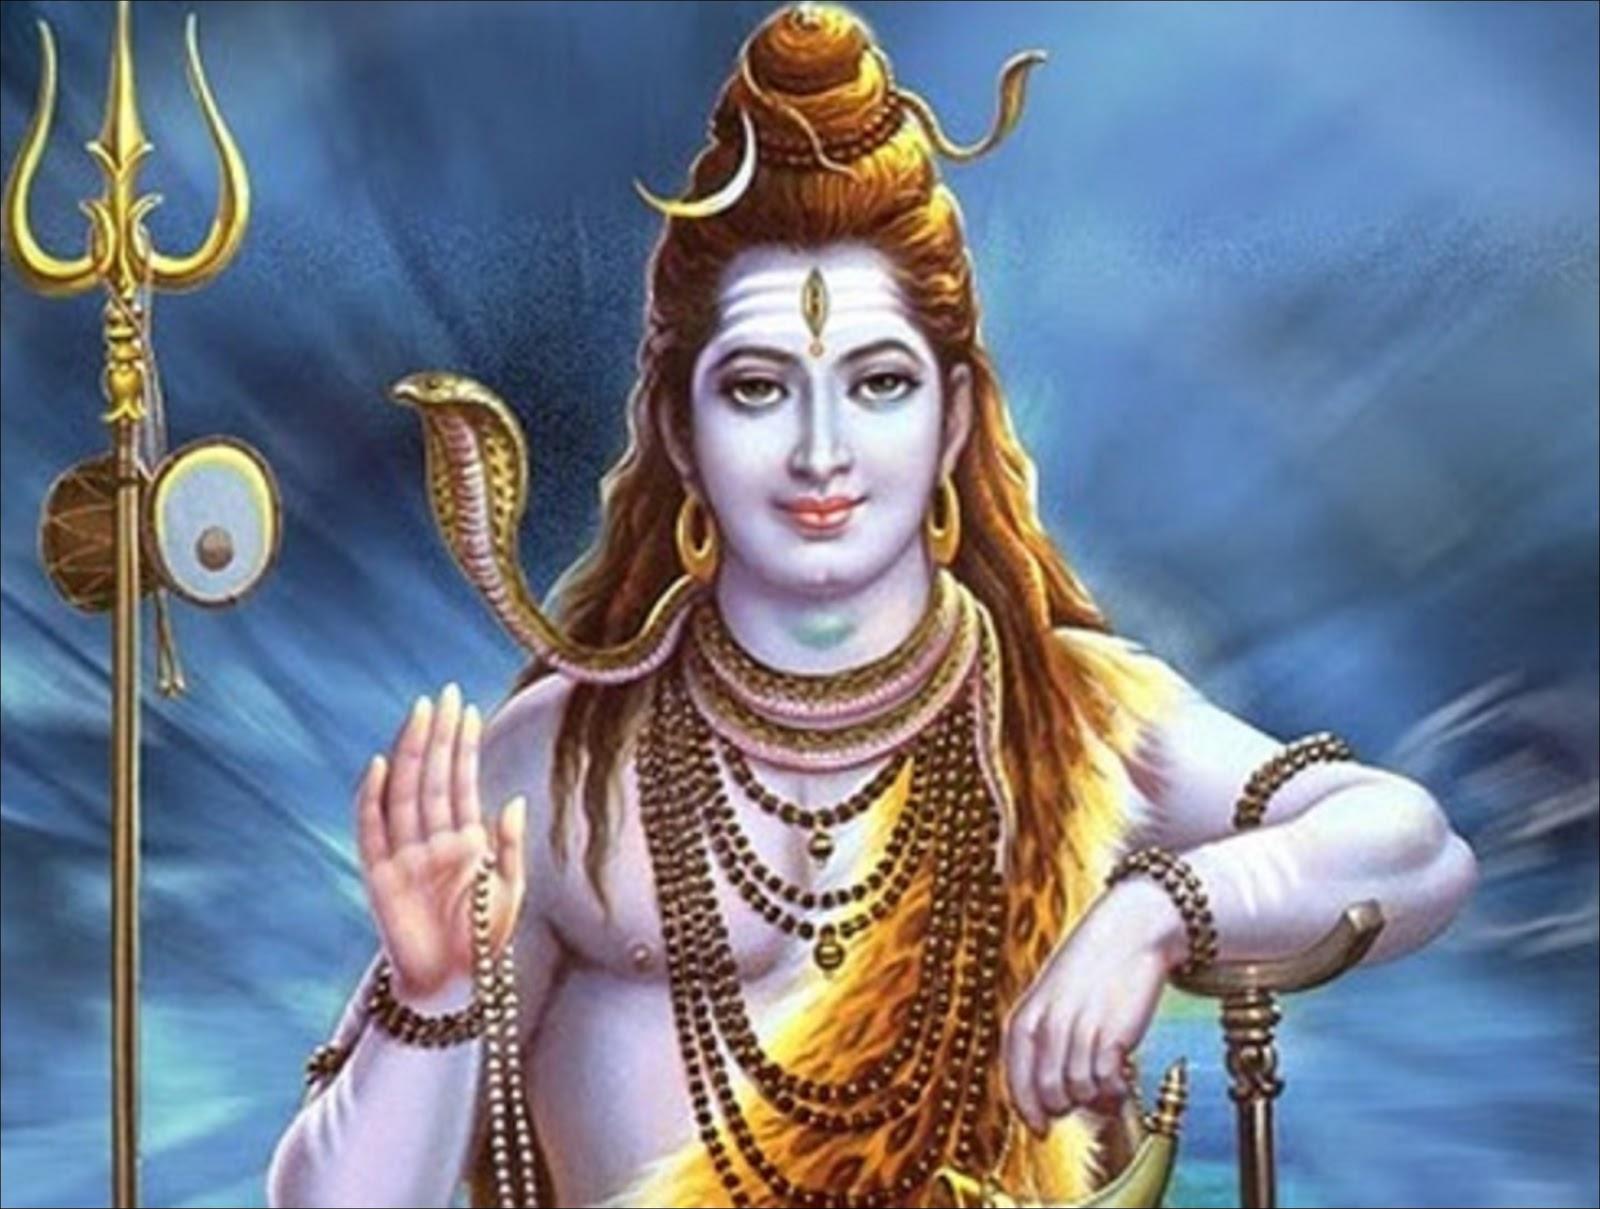 [50+] Lord Shiva Wallpapers 3D on WallpaperSafari